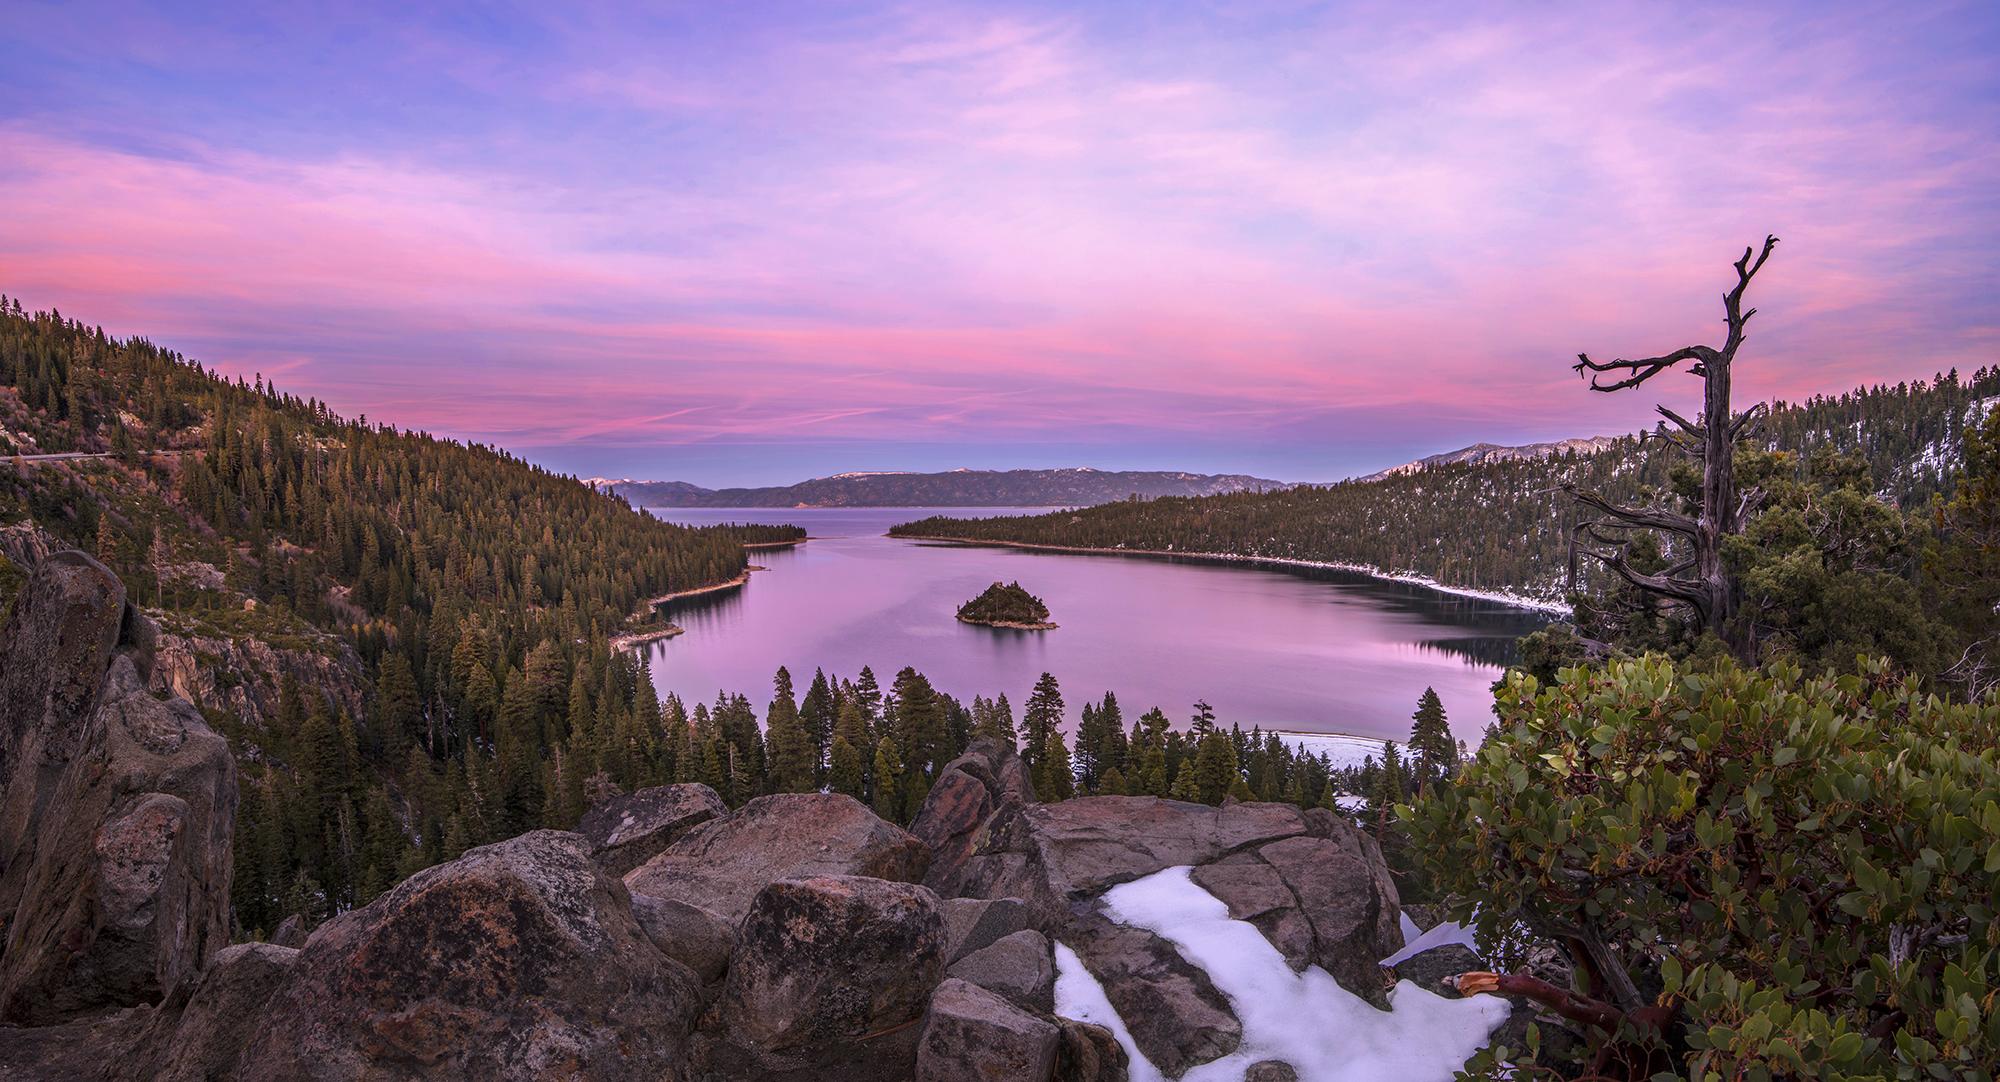 emerald bay sunset 11-18